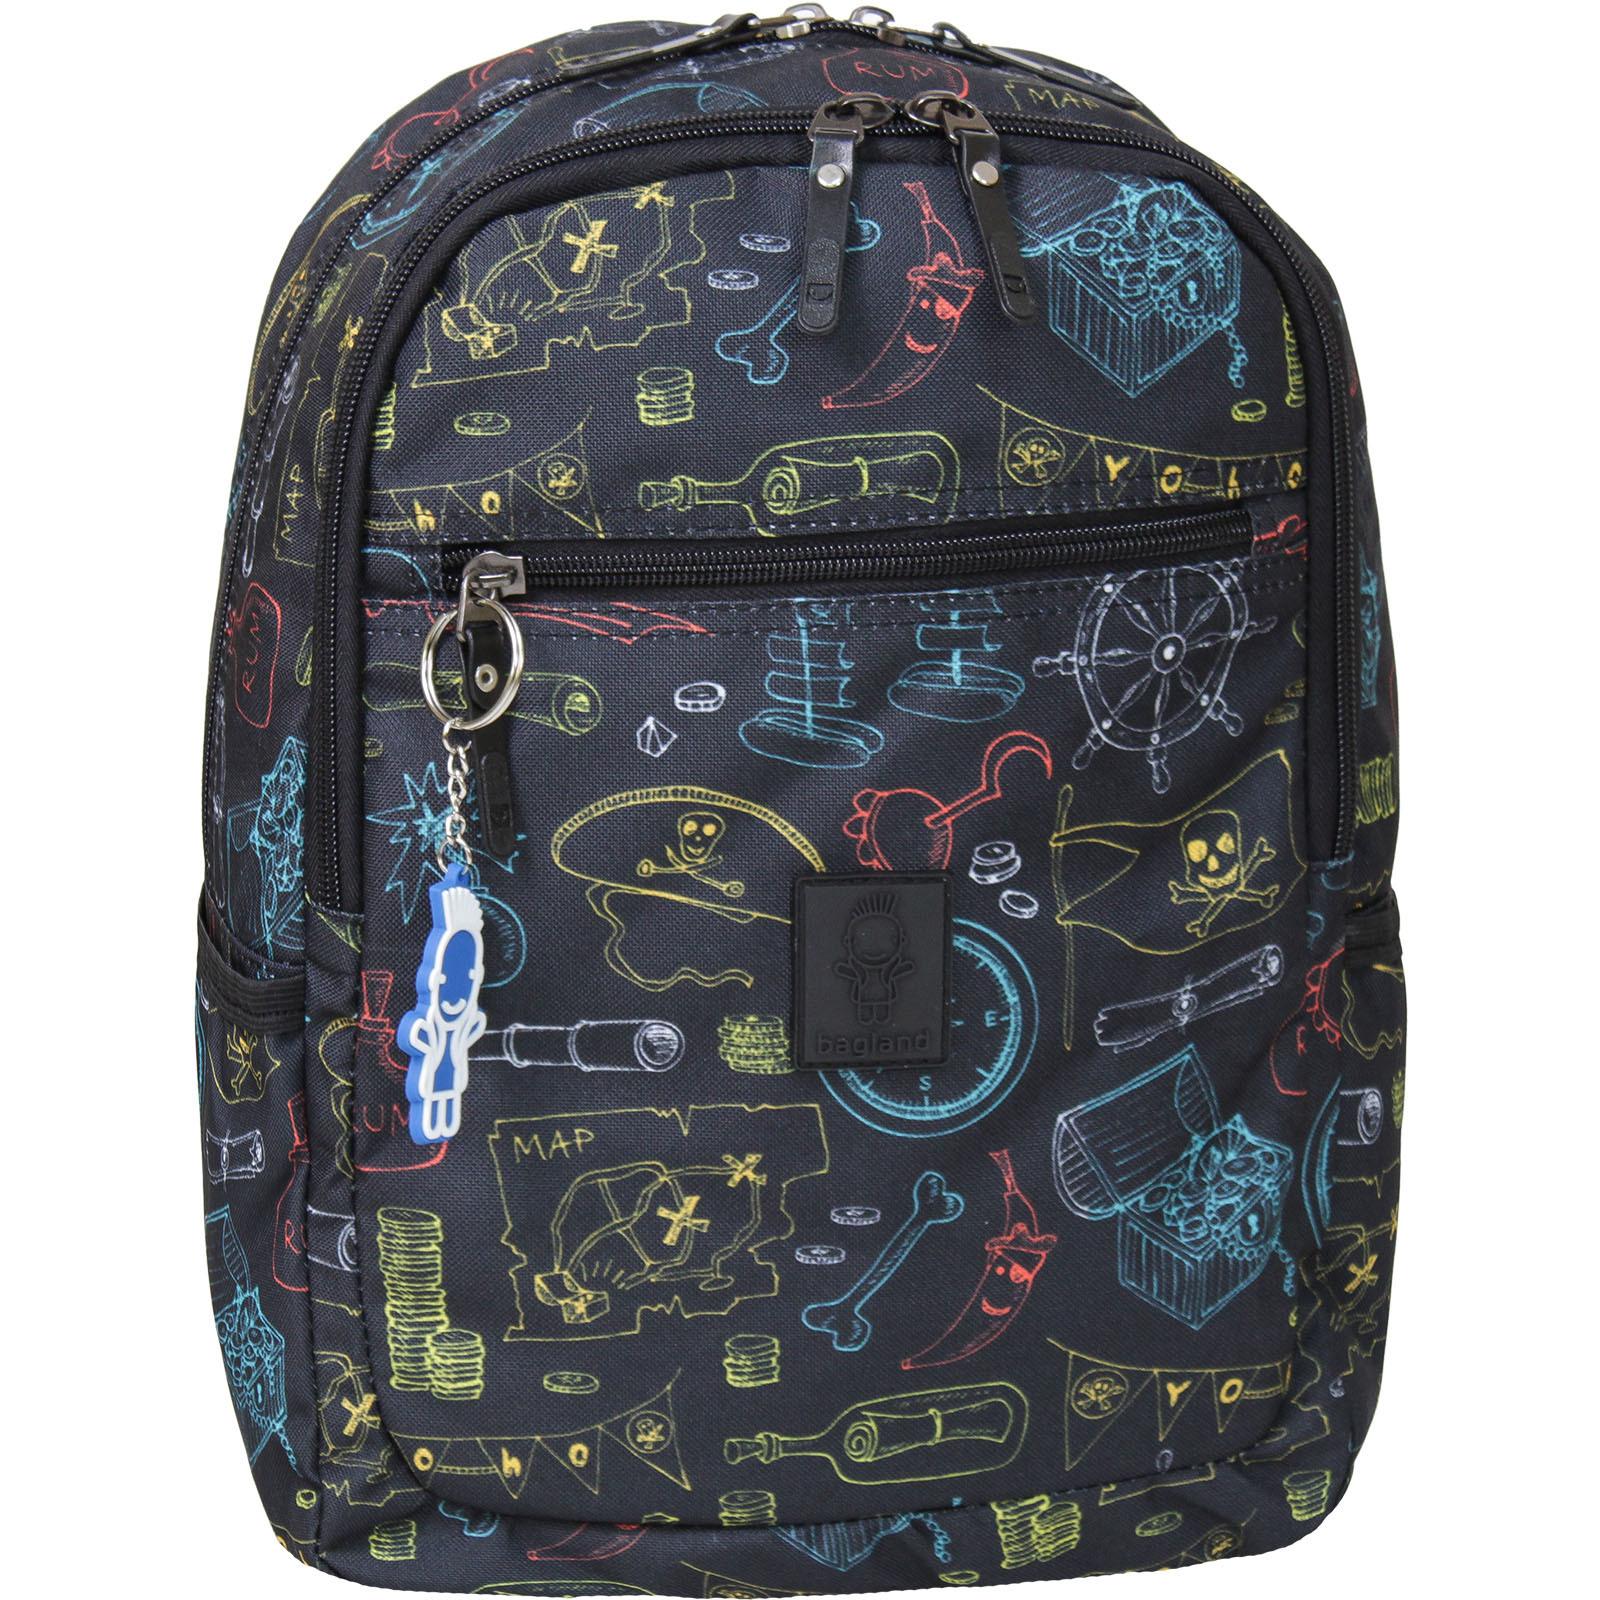 Детские рюкзаки Рюкзак Bagland Young 13 л. сублімація 258 (00510664) IMG_8820-1600.jpg